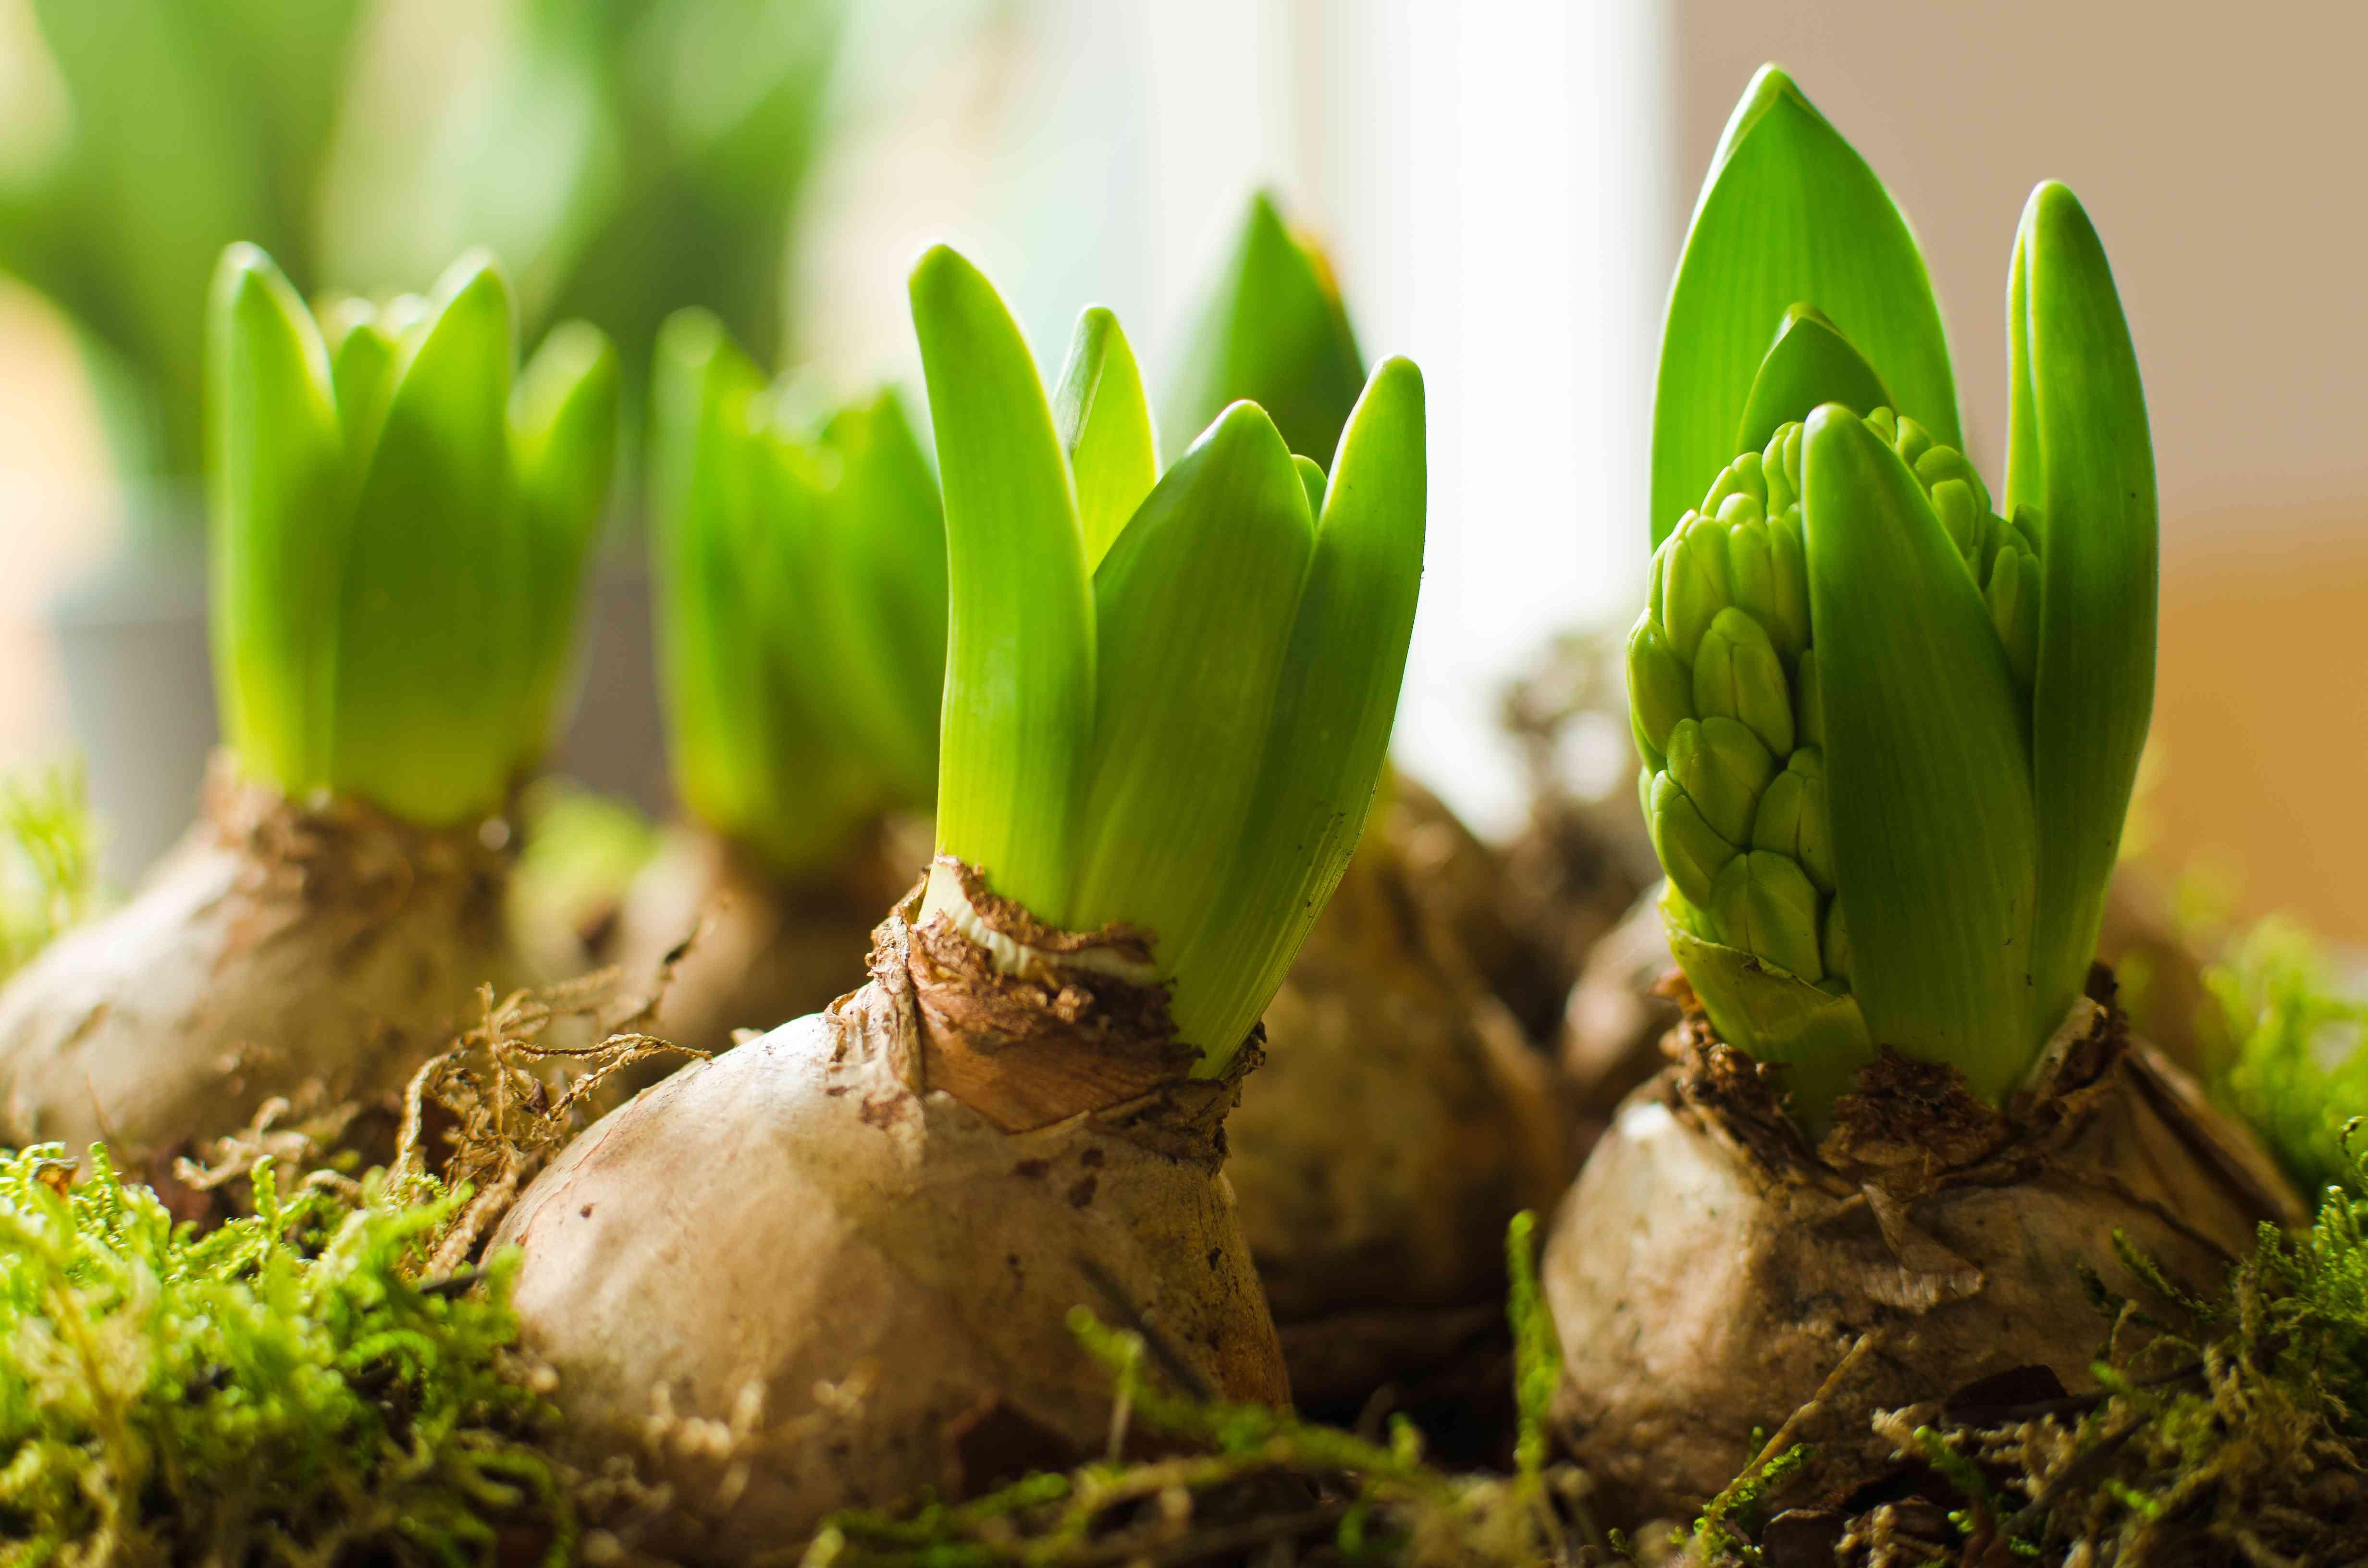 Several hyacinth bulbs growing inside